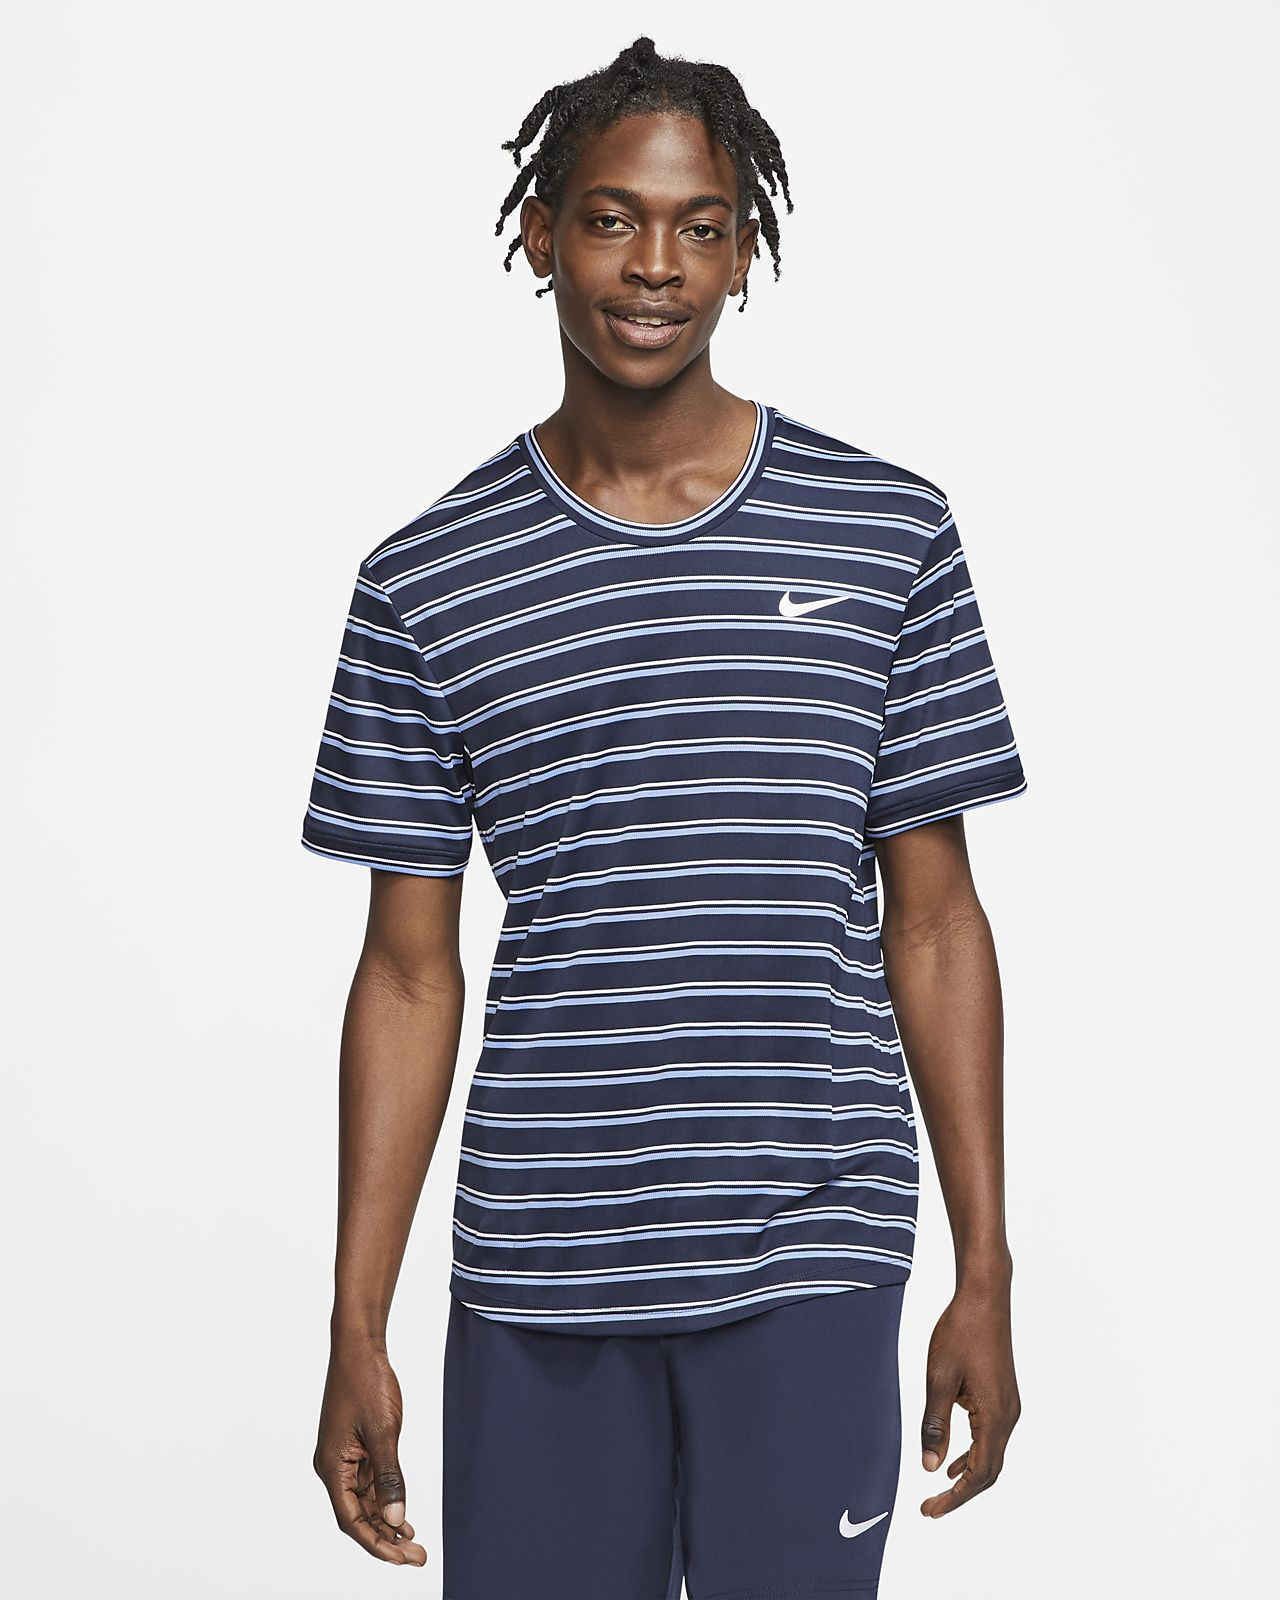 NikeCourt Dri-FIT Men's Graphic Tennis Top